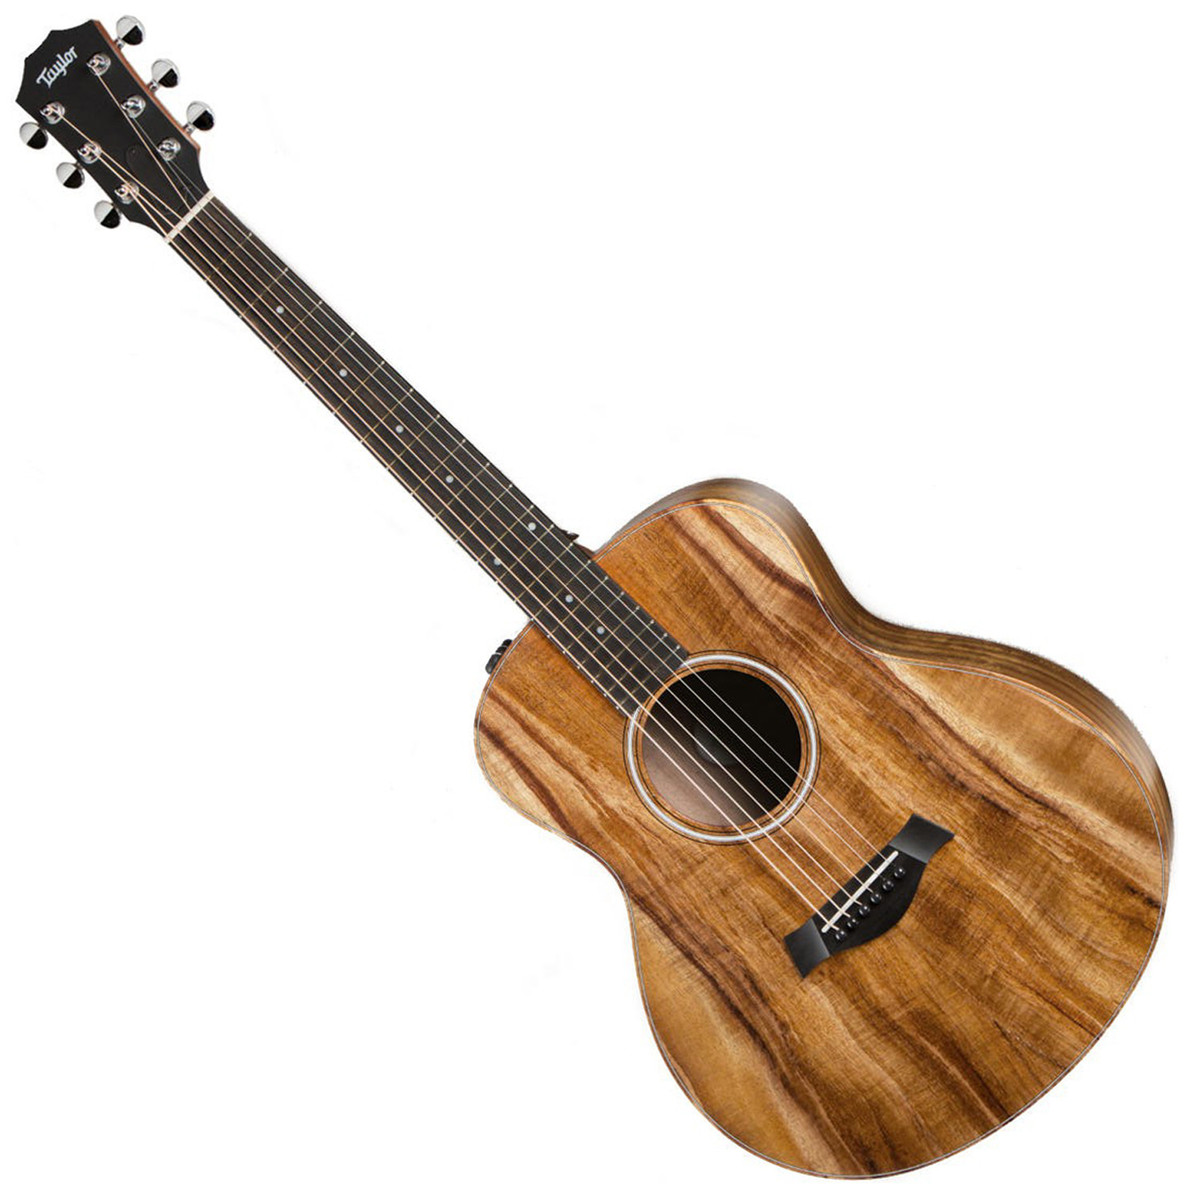 Guitarra Electroacústica Taylor Mini GS E-koa 1